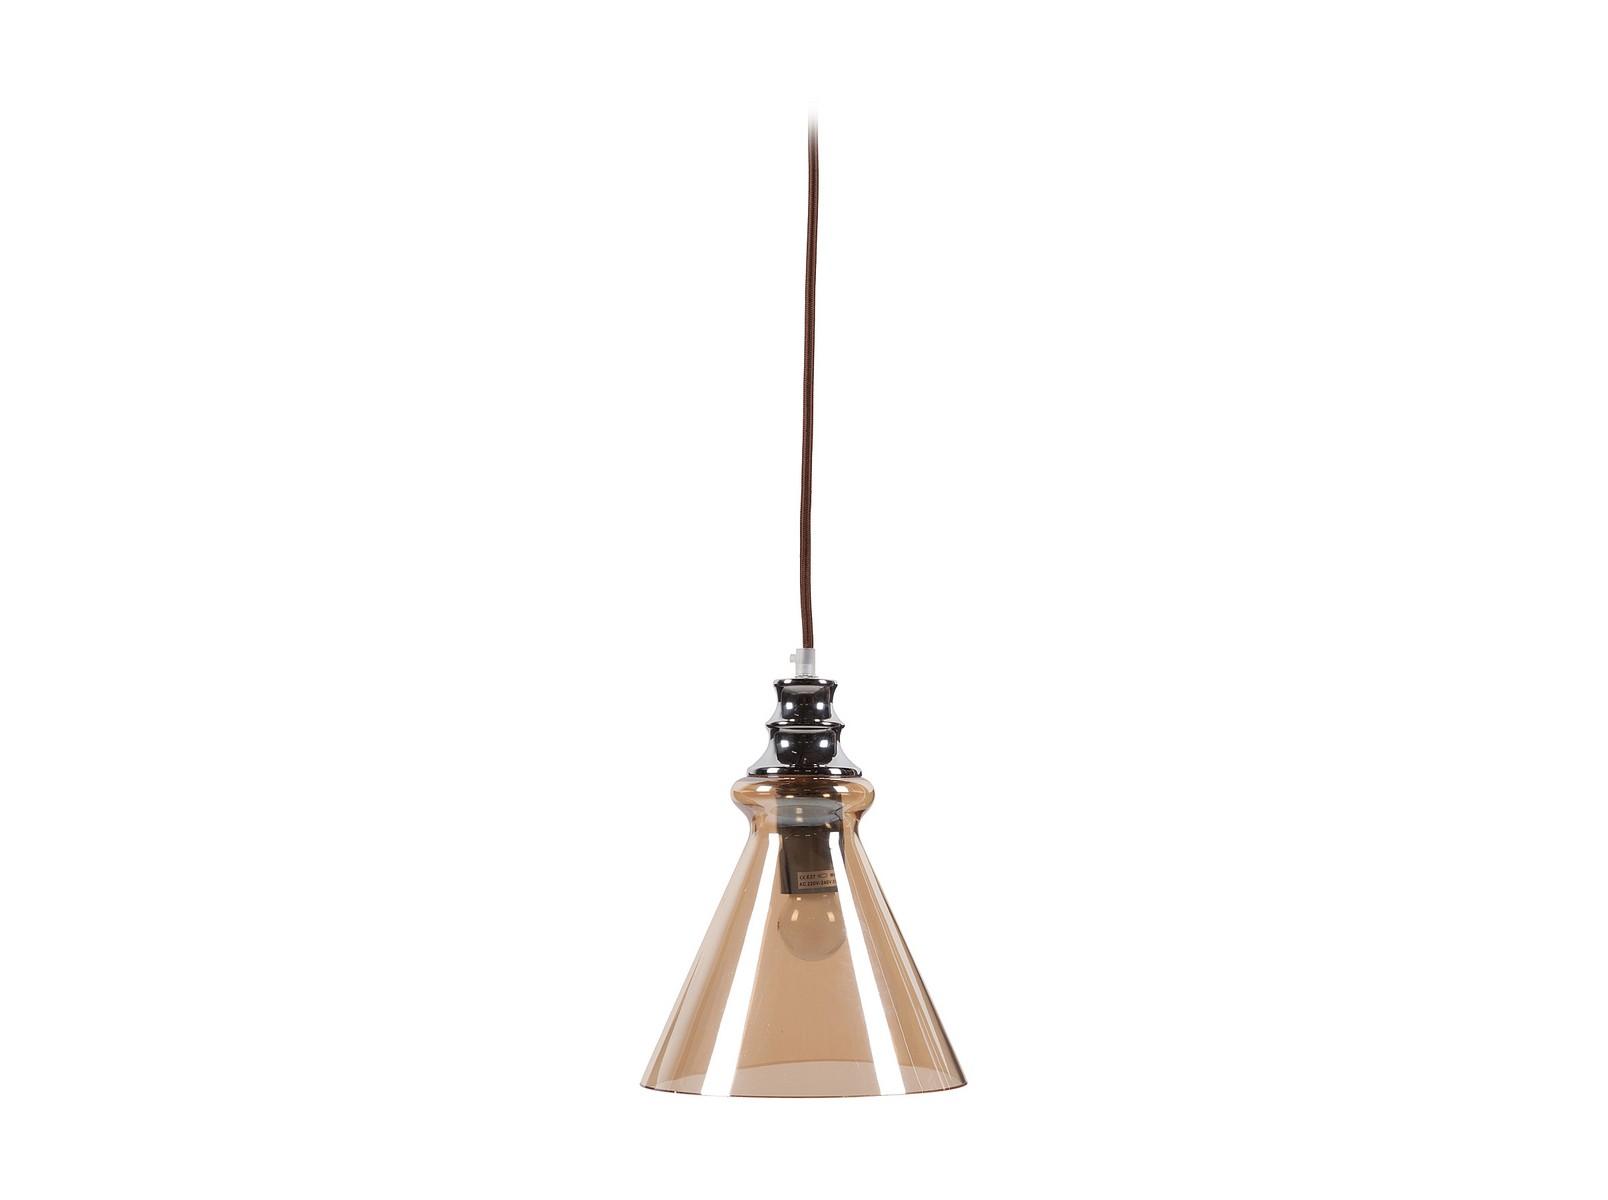 Подвесной светильник LanaПодвесные светильники<br>&amp;lt;div&amp;gt;Вид цоколя: Е27&amp;lt;/div&amp;gt;&amp;lt;div&amp;gt;Мощность лампы: 40W&amp;lt;/div&amp;gt;&amp;lt;div&amp;gt;Количество ламп: 1&amp;lt;/div&amp;gt;&amp;lt;div&amp;gt;Наличие ламп: нет&amp;lt;/div&amp;gt;<br><br>Material: Стекло<br>Height см: 28<br>Diameter см: 20